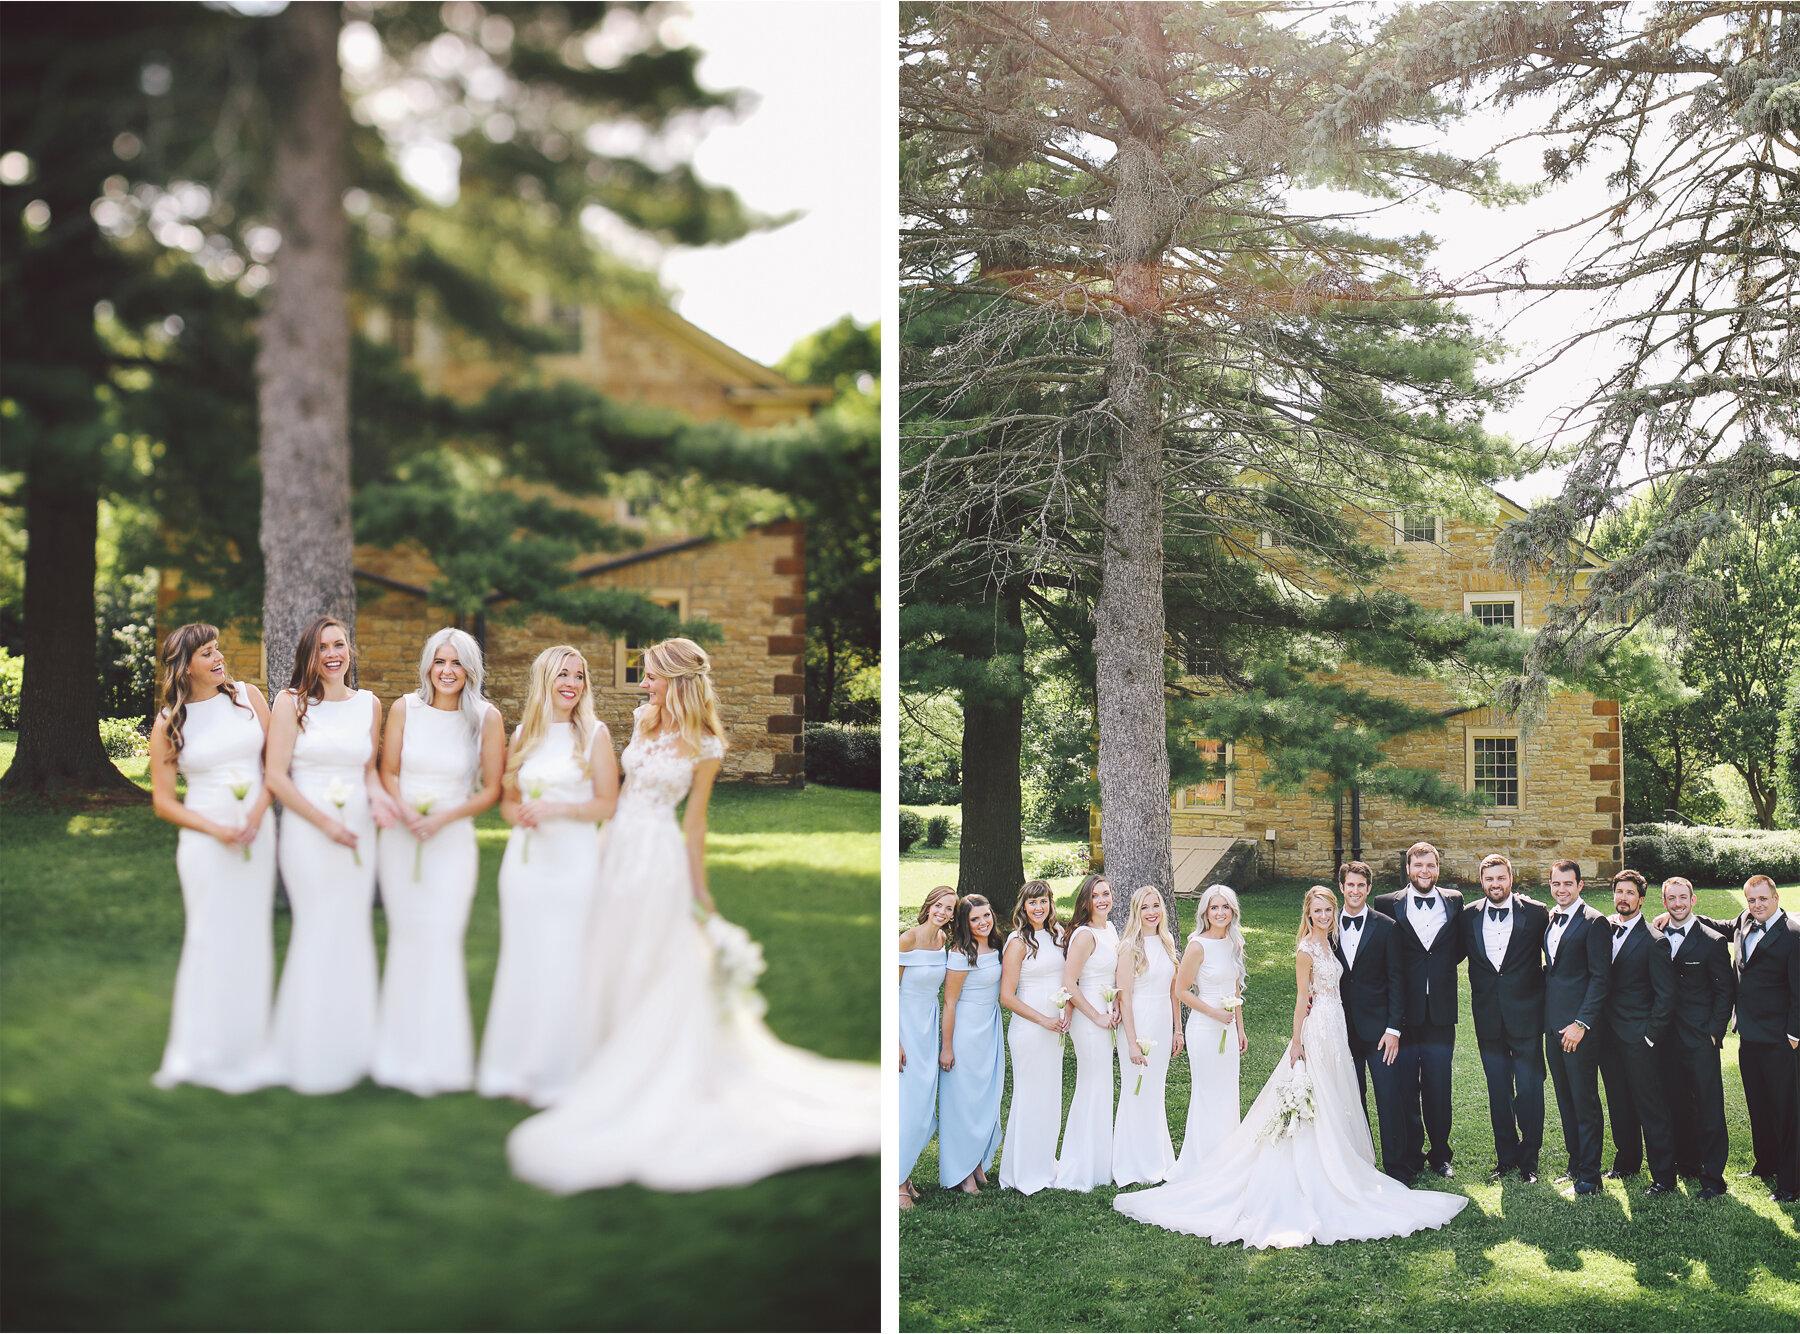 10 Wedding Vick Photography Minneapolis Minnesota Bride Groom Bridesmaids Groomsmen Michelle and William.jpg